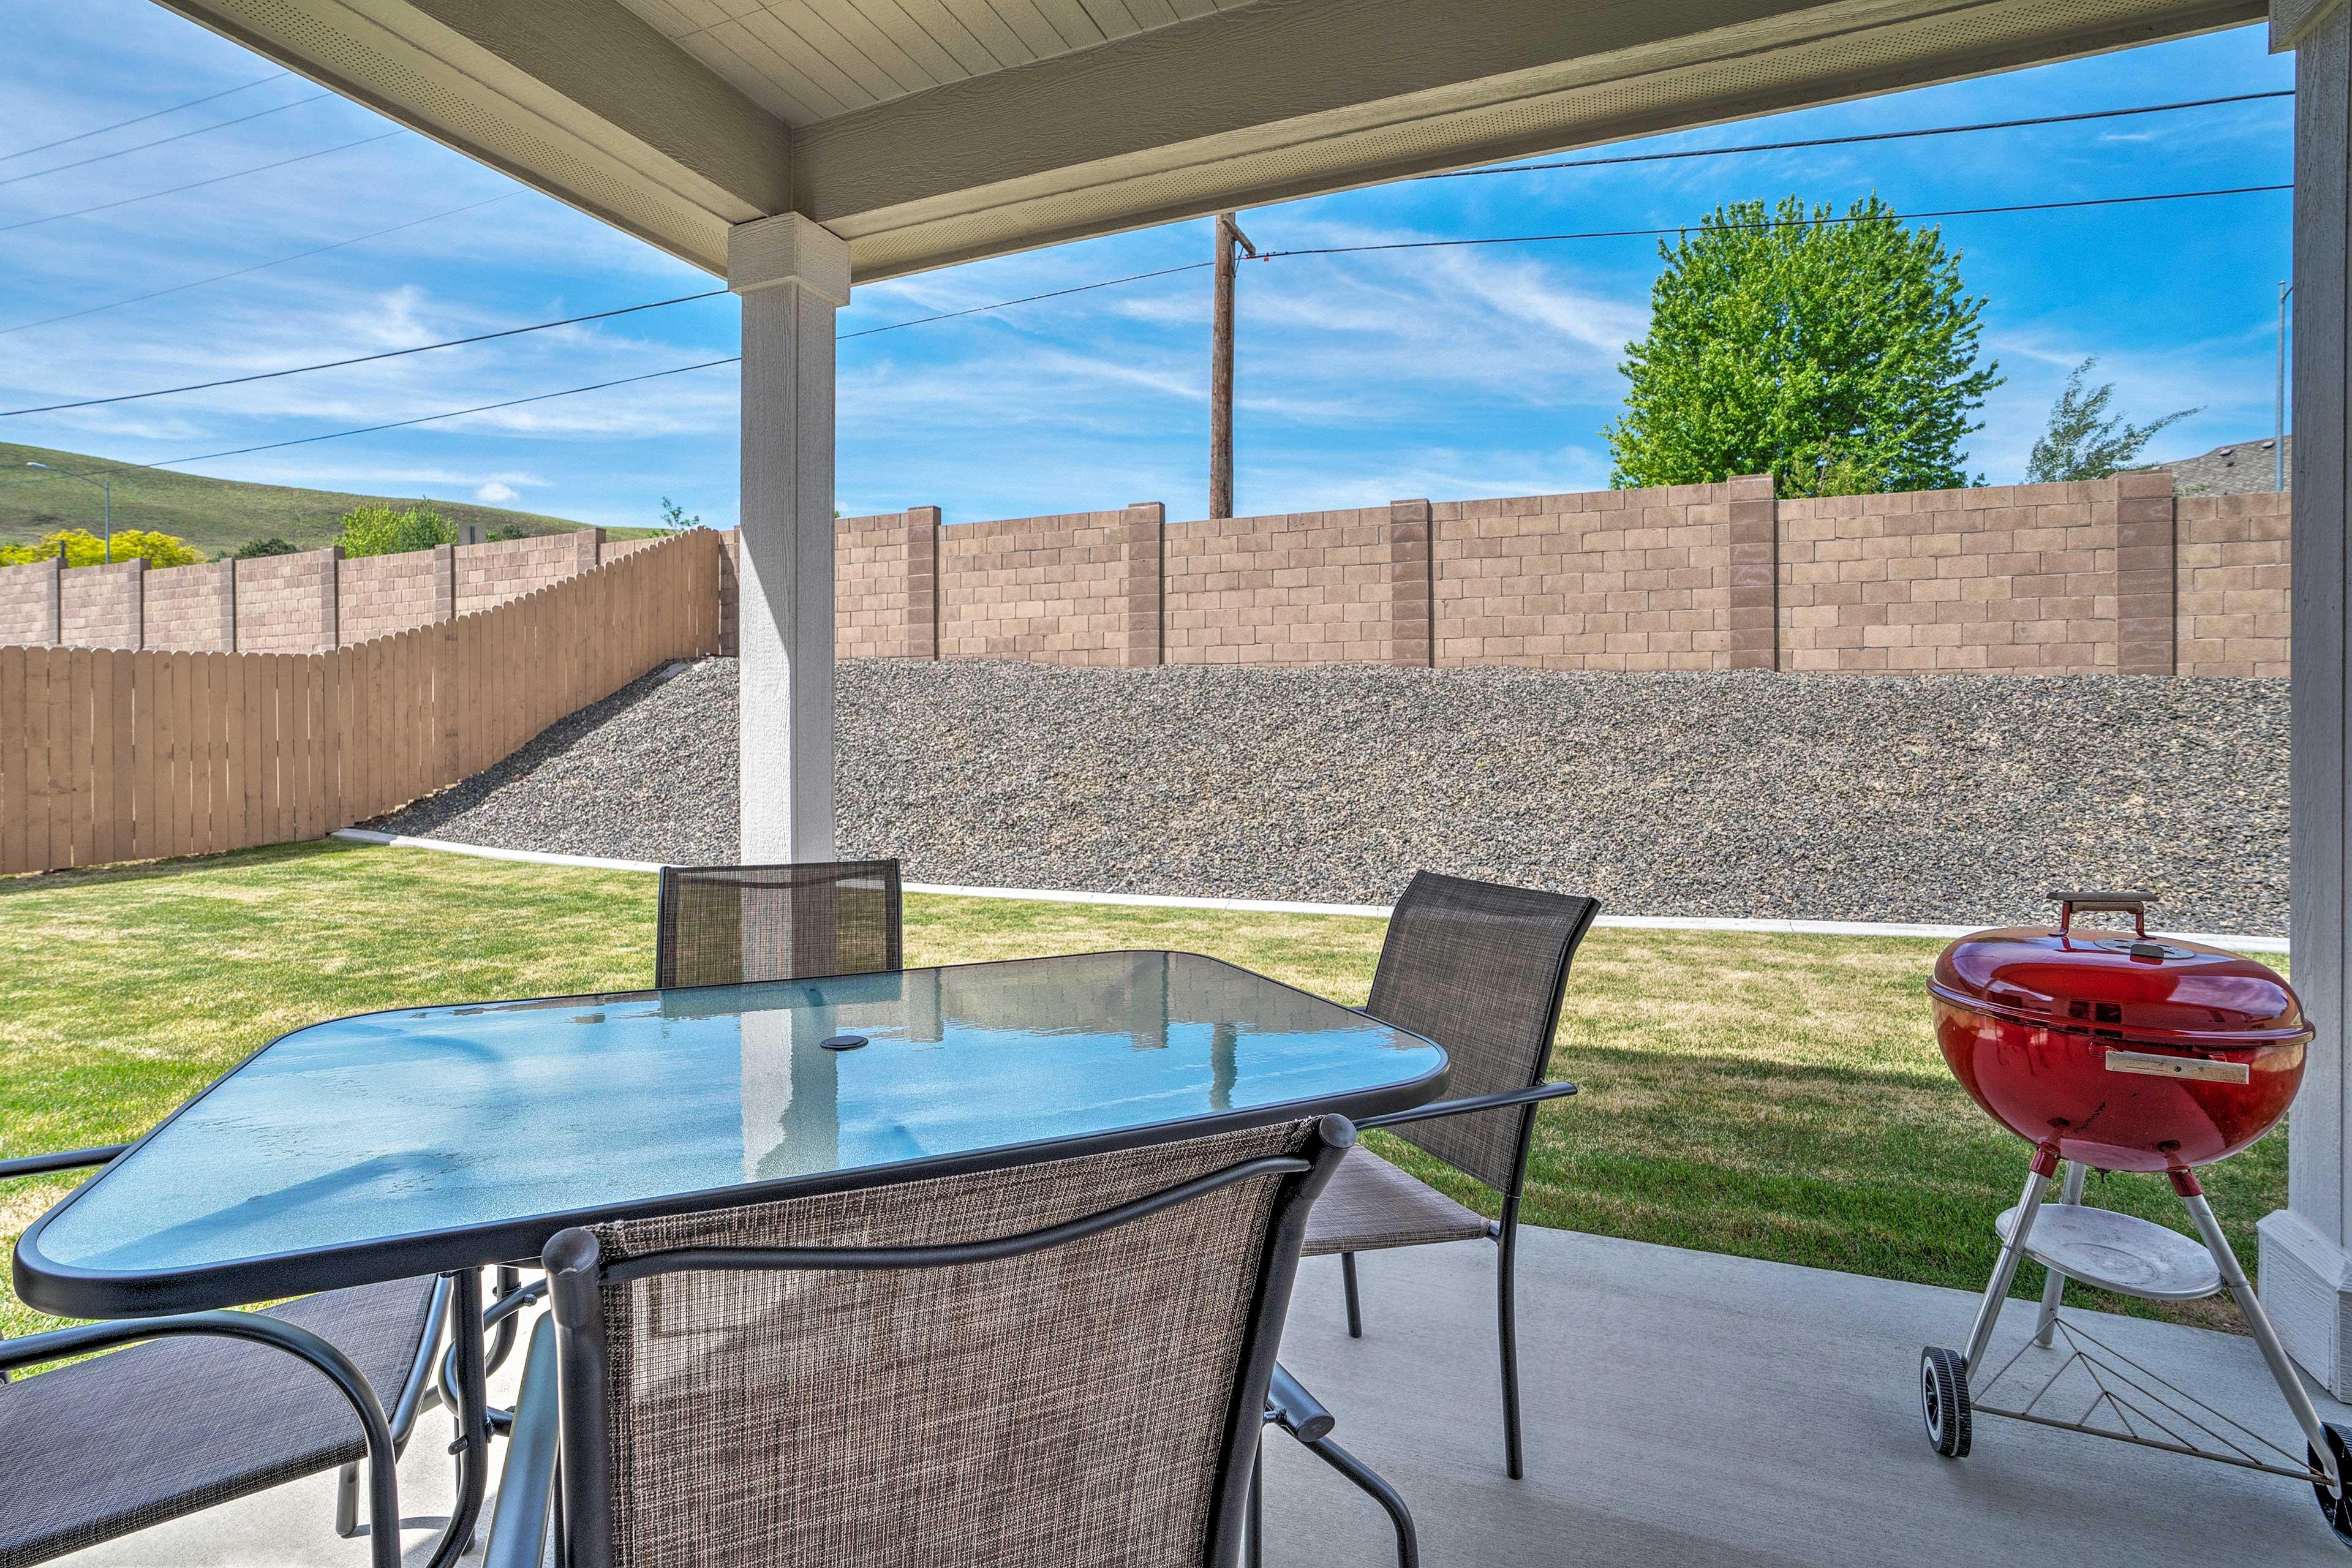 Private Backyard   Furnished Patio